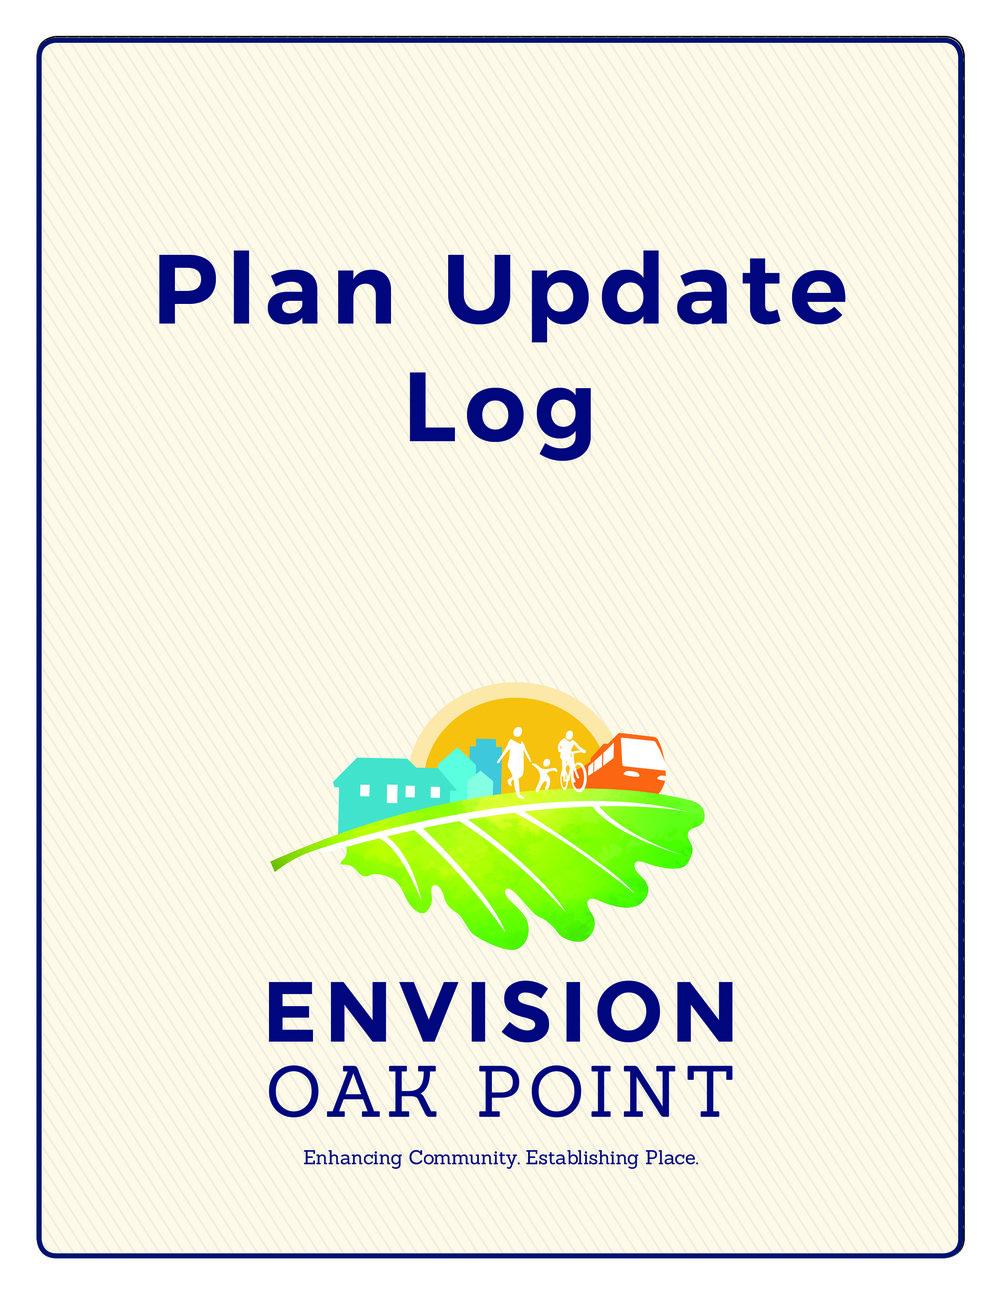 Envision Oak Point Plan Update Log